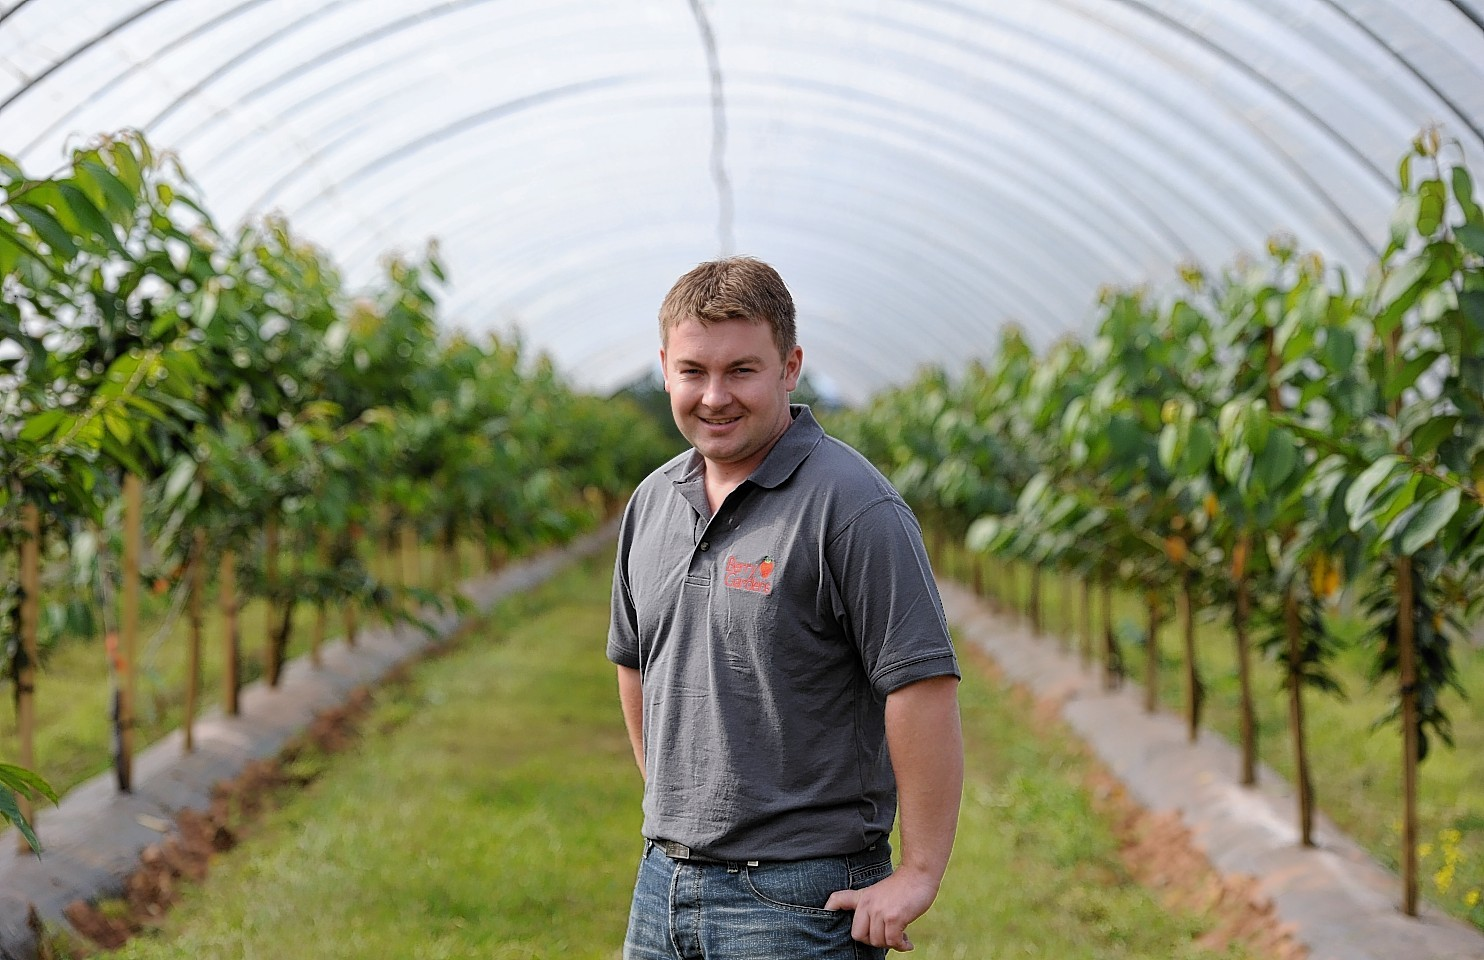 Ross Mitchell of Castleton Farm